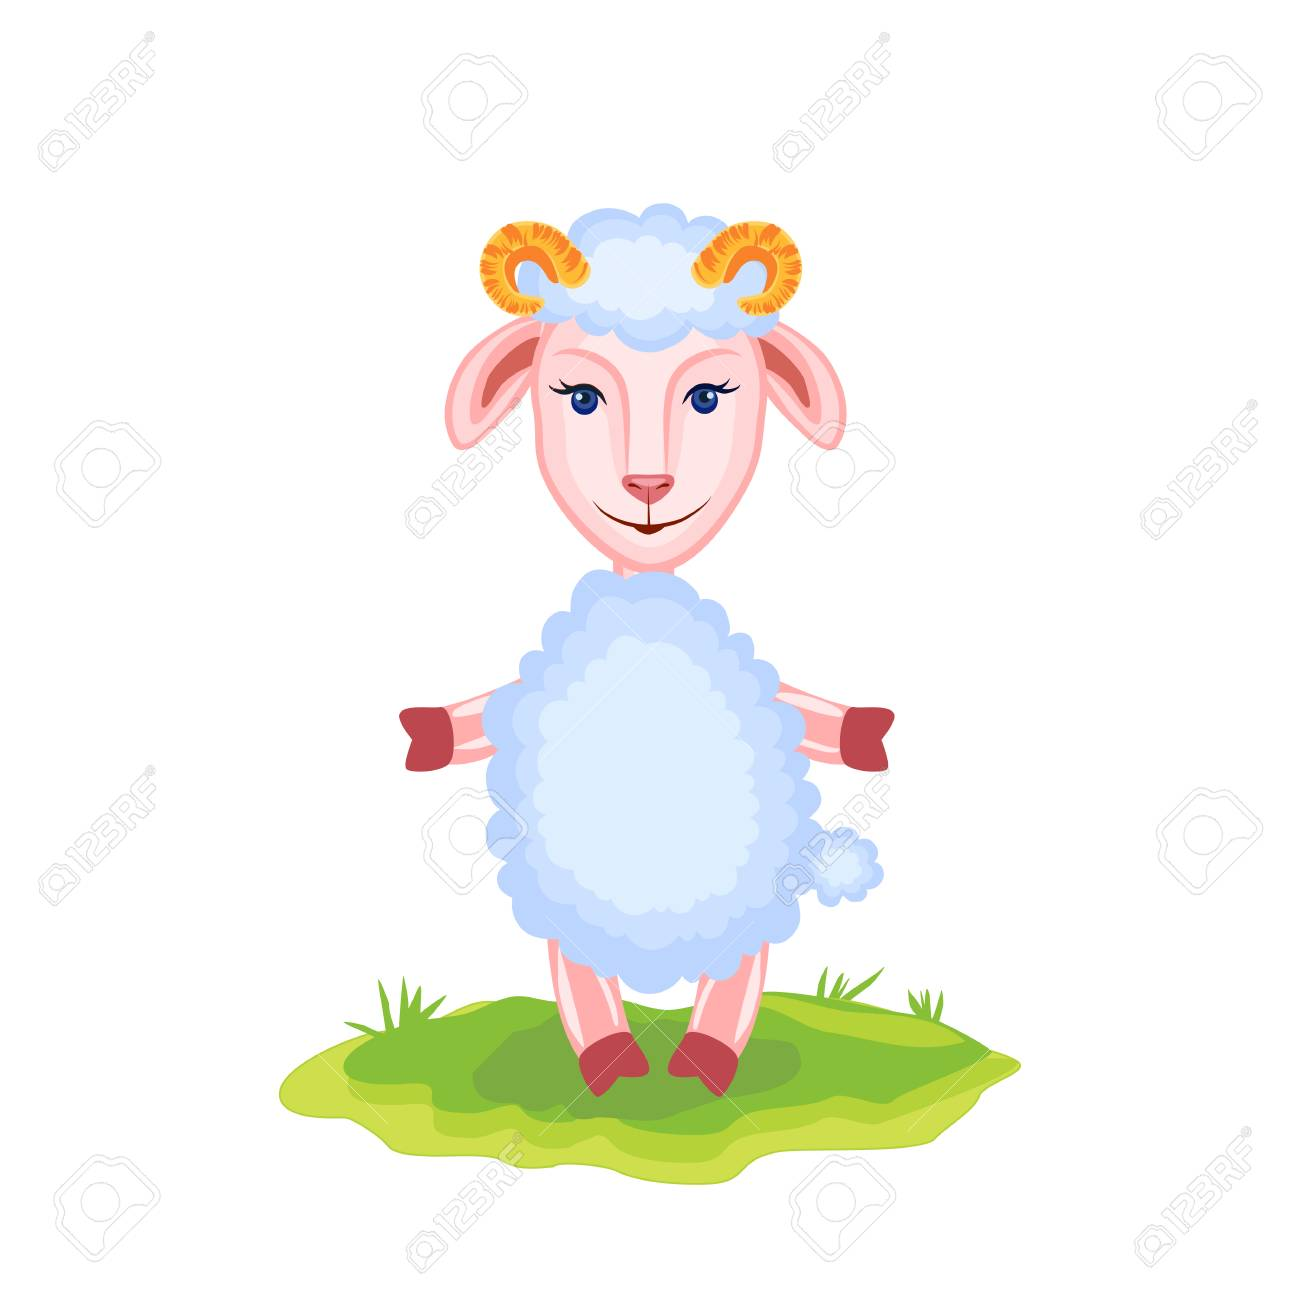 Cartoon funny lamb kid cartoon animal domestic cute ship on cartoon funny lamb kid cartoon animal domestic cute ship on green grass isolated on voltagebd Images